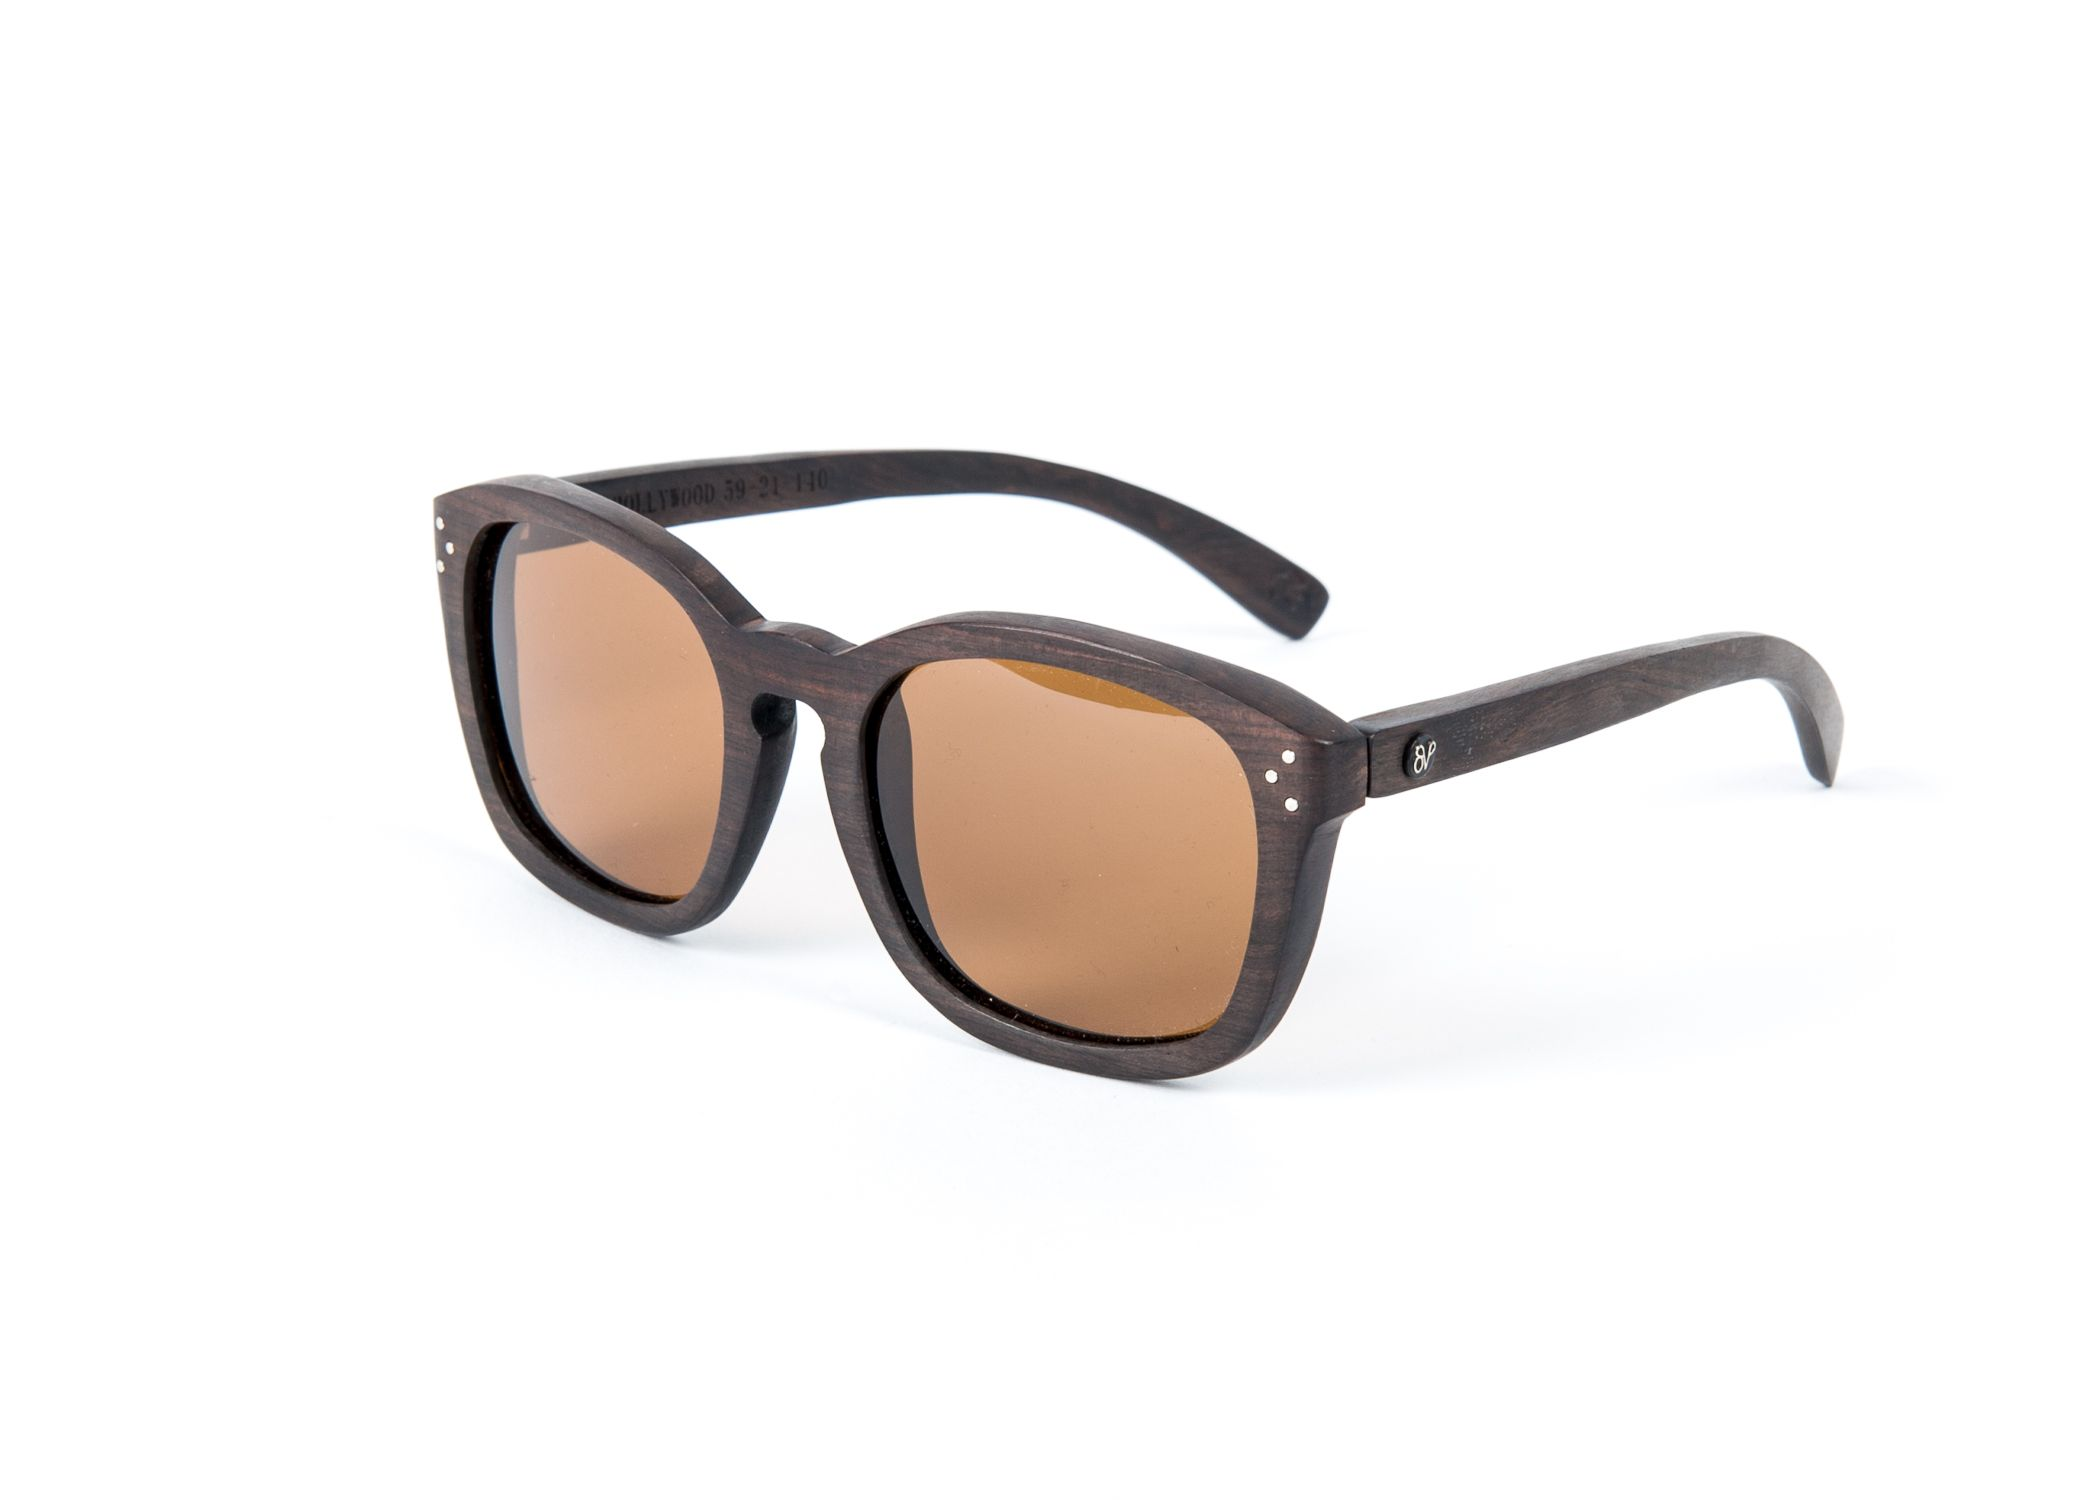 Premier Designs California Capital Airshow: Hollywood, Ebony Wood Polarized Sunglasses. Oversized